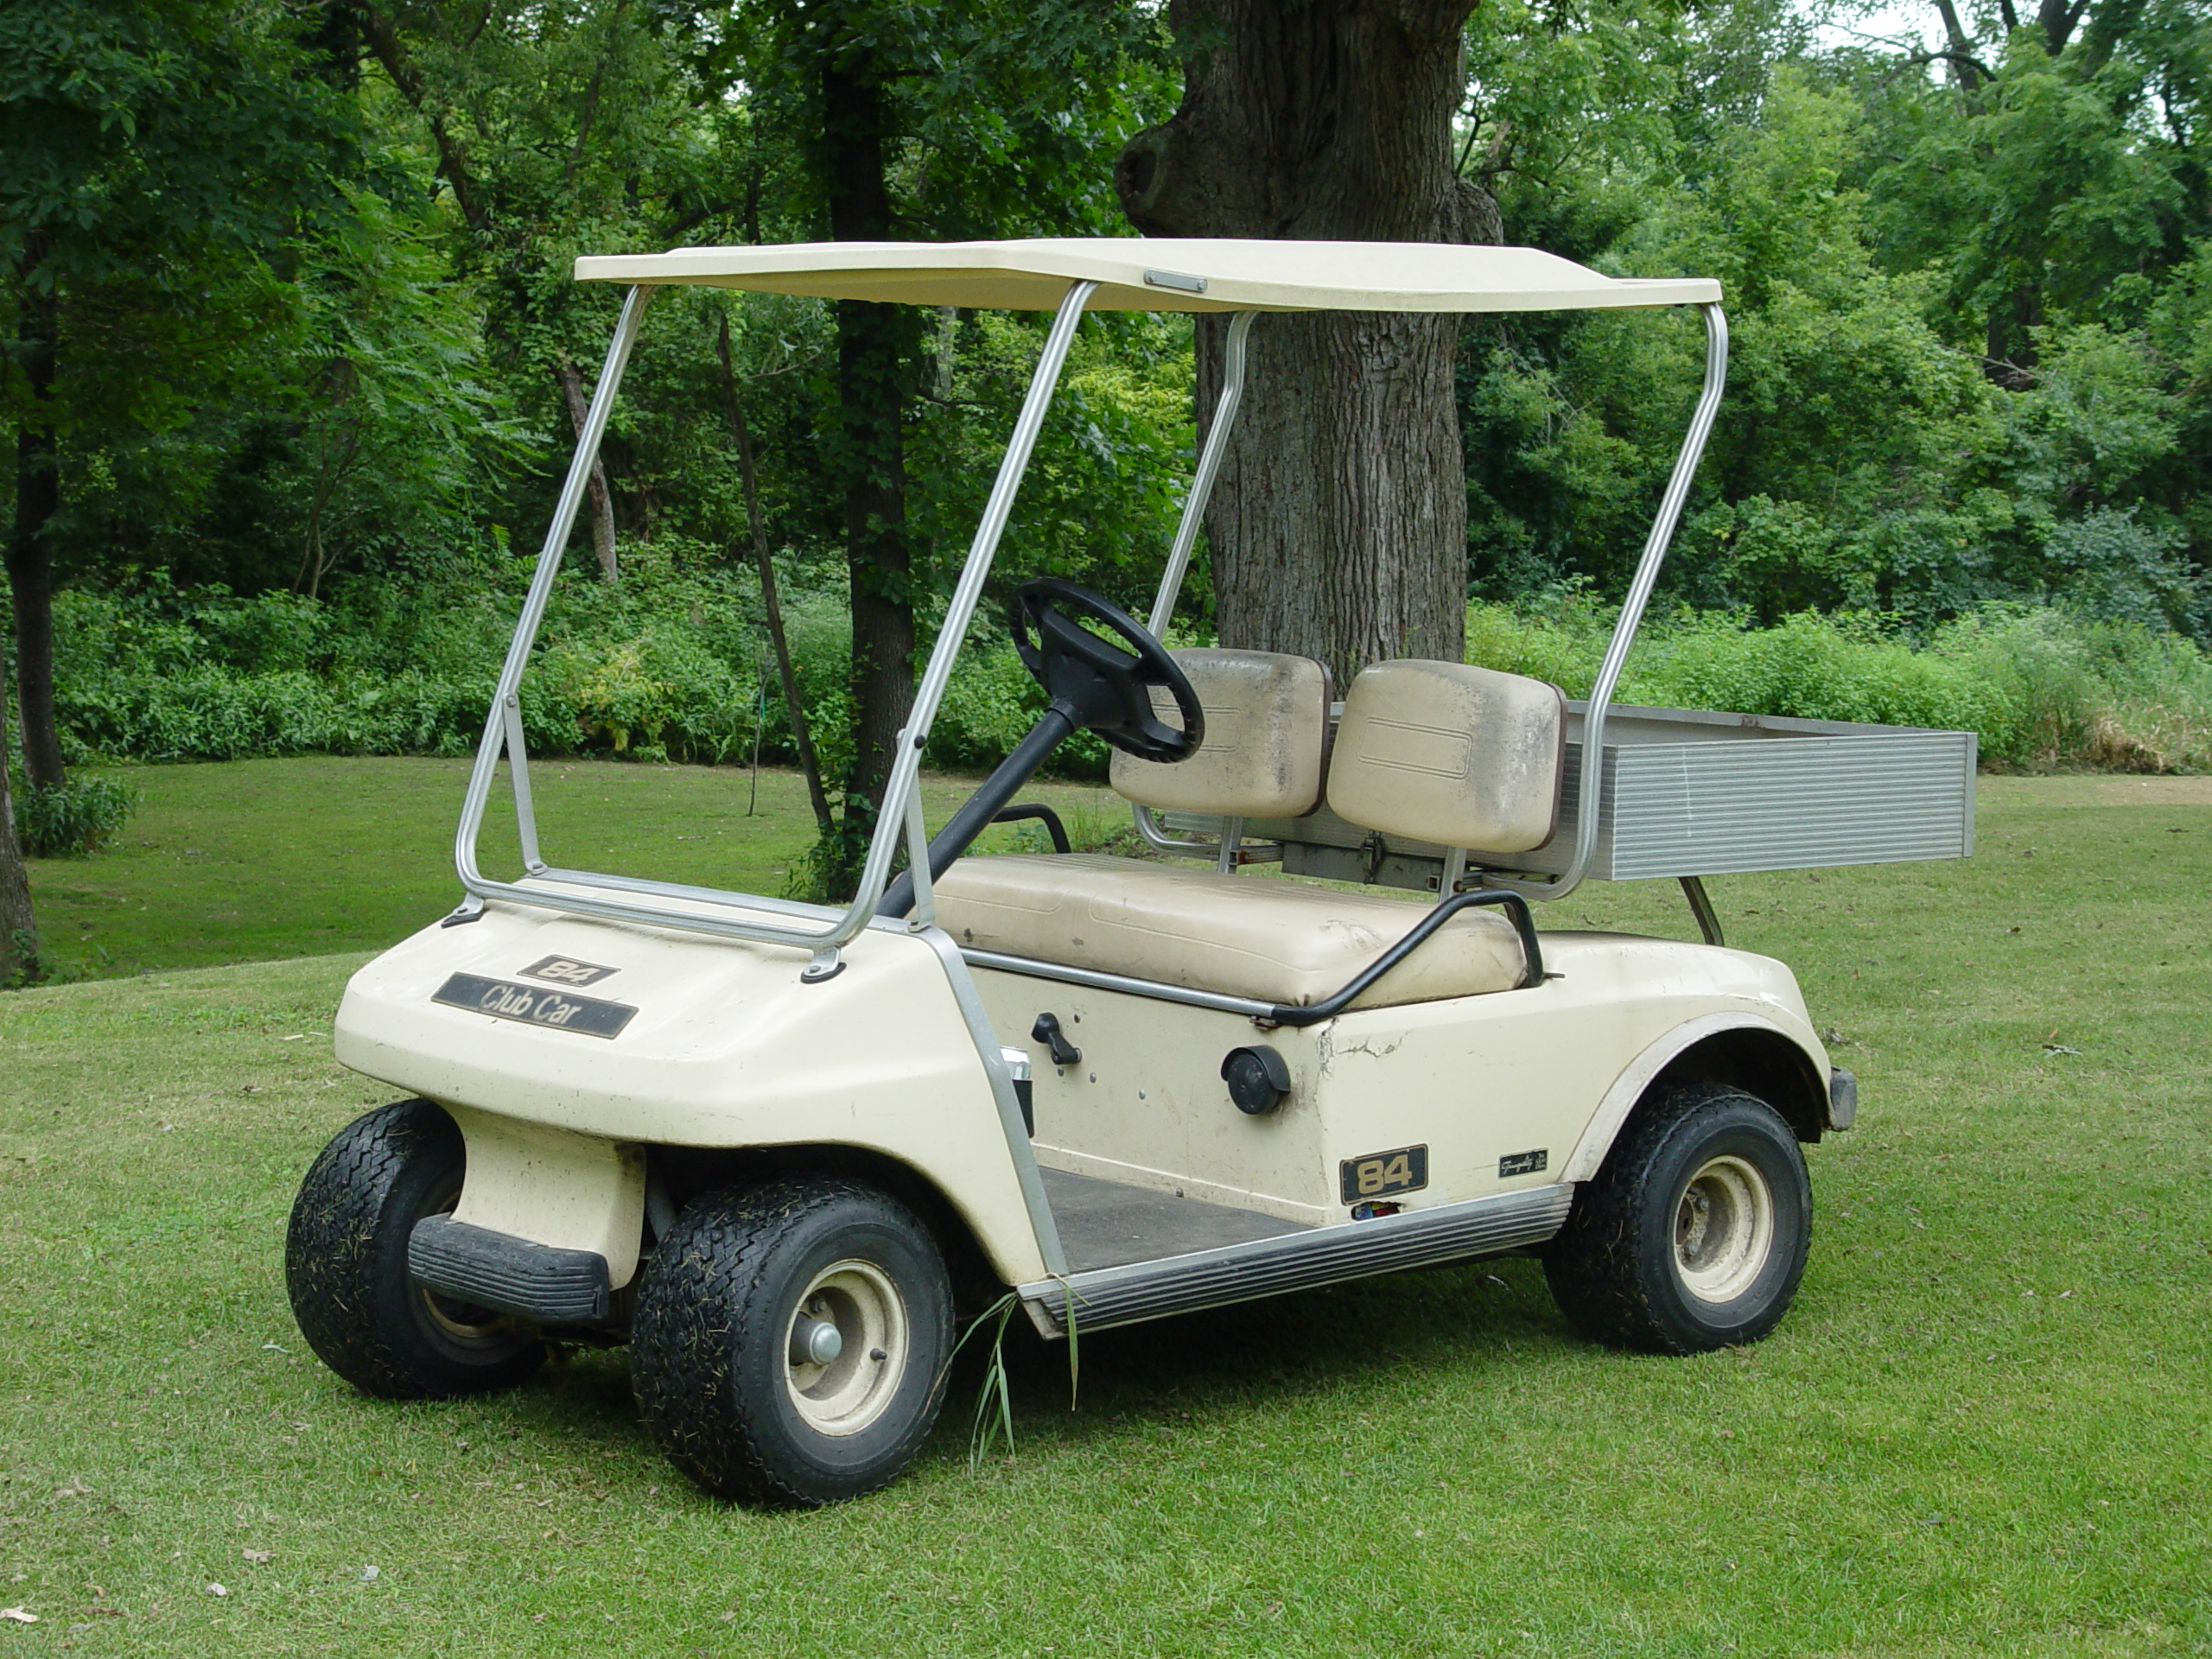 Fabulous How To Troubleshoot Your Ezgo Golf Cart Gator Golf Cars Wiring Cloud Onicaalyptbenolwigegmohammedshrineorg